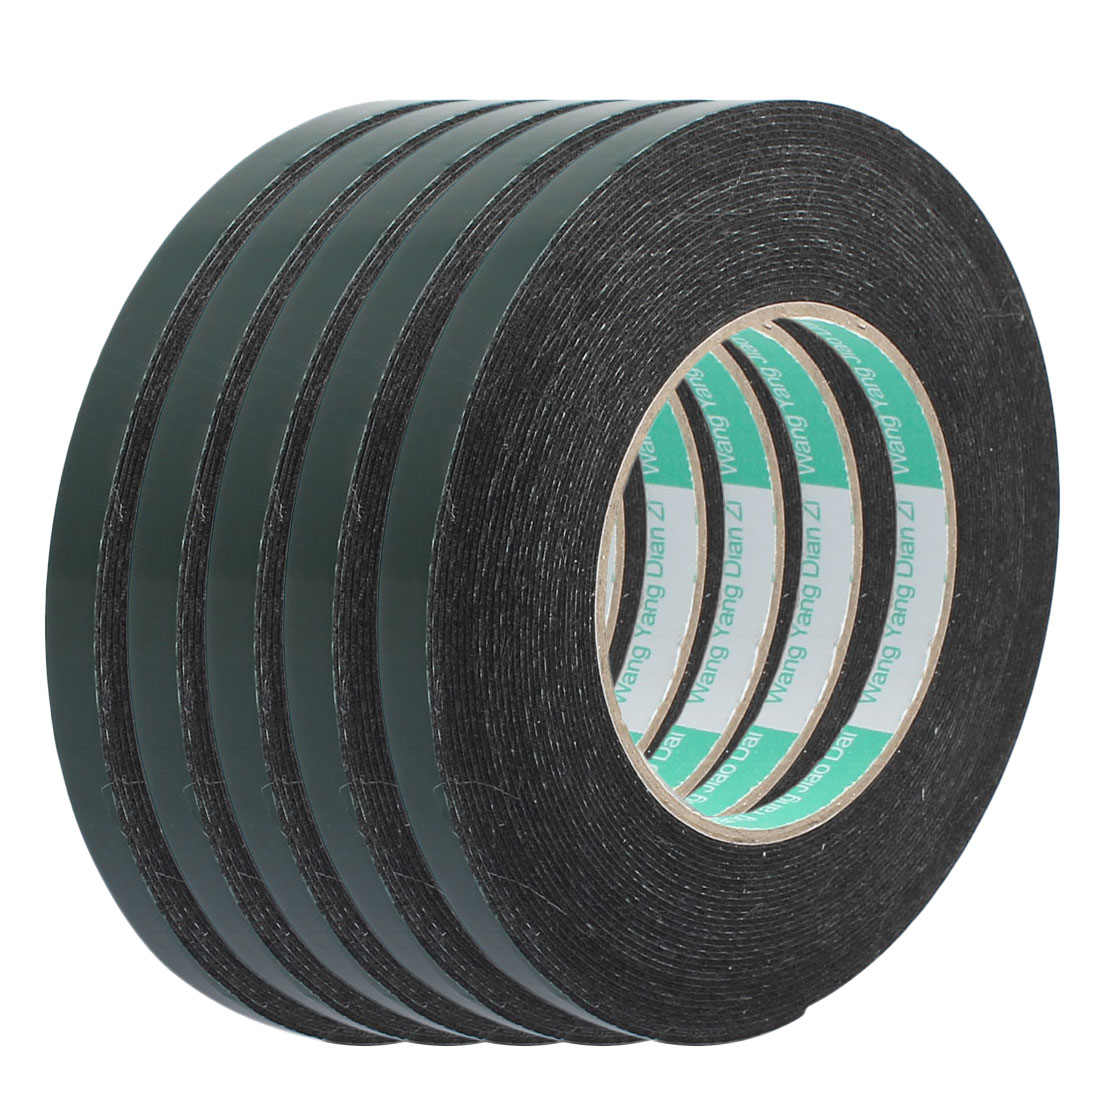 5 Pcs 10M Length 10mm x 1mm Dual-side Self Adhesive Shockproof Sponge Foam Tape